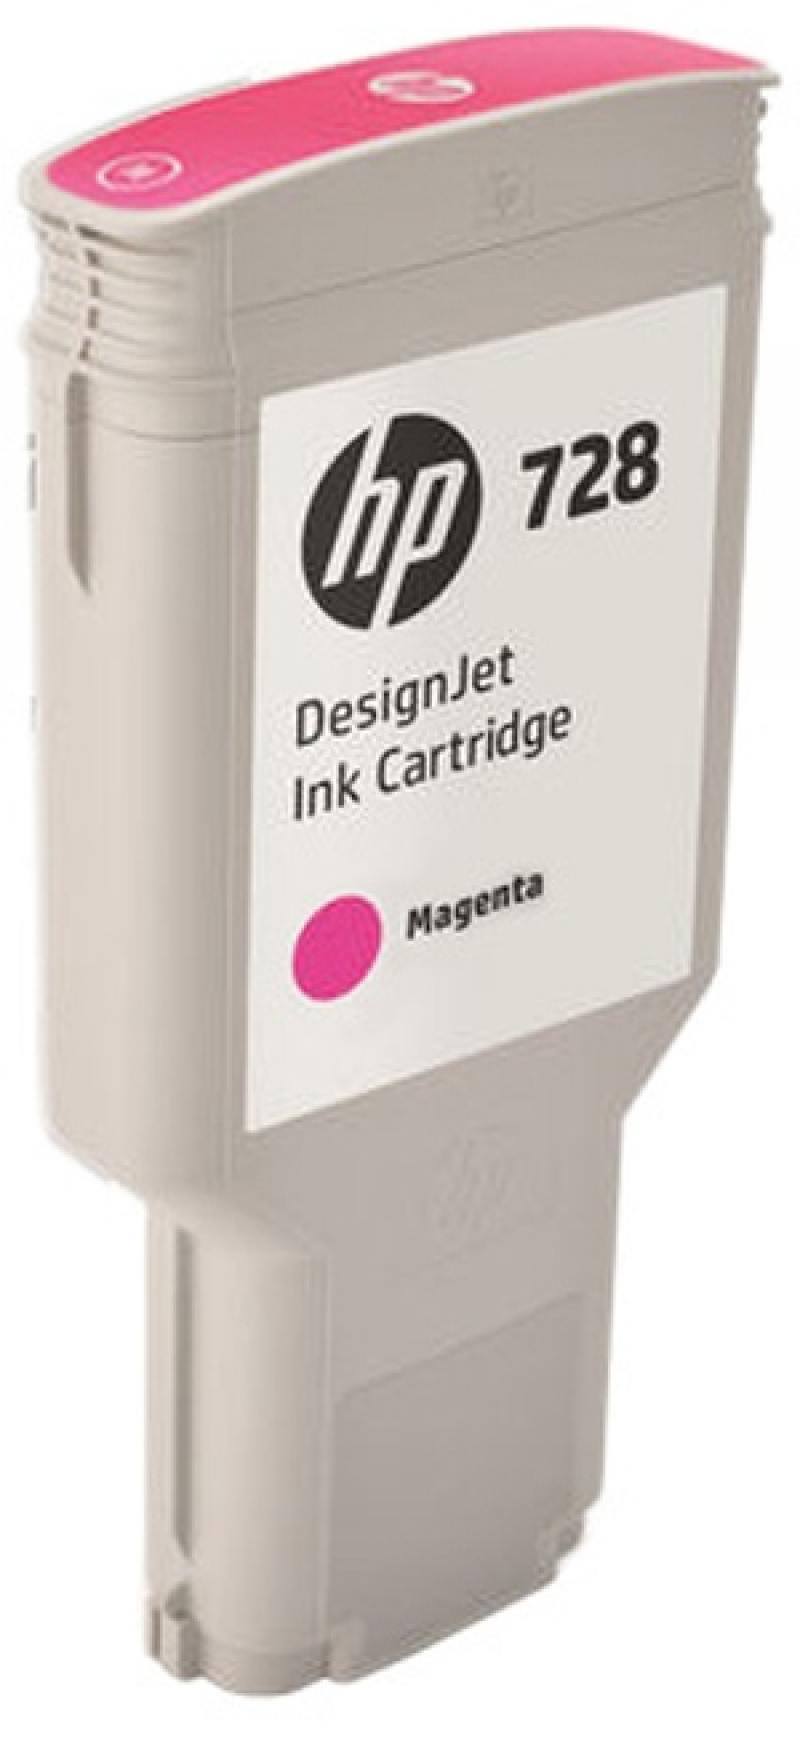 Картридж HP F9K16A (HP 728) для DesignJet T730, T830. Пурпурный. 300 мл. kaypro краска для волос kay direct зеленый 100 мл